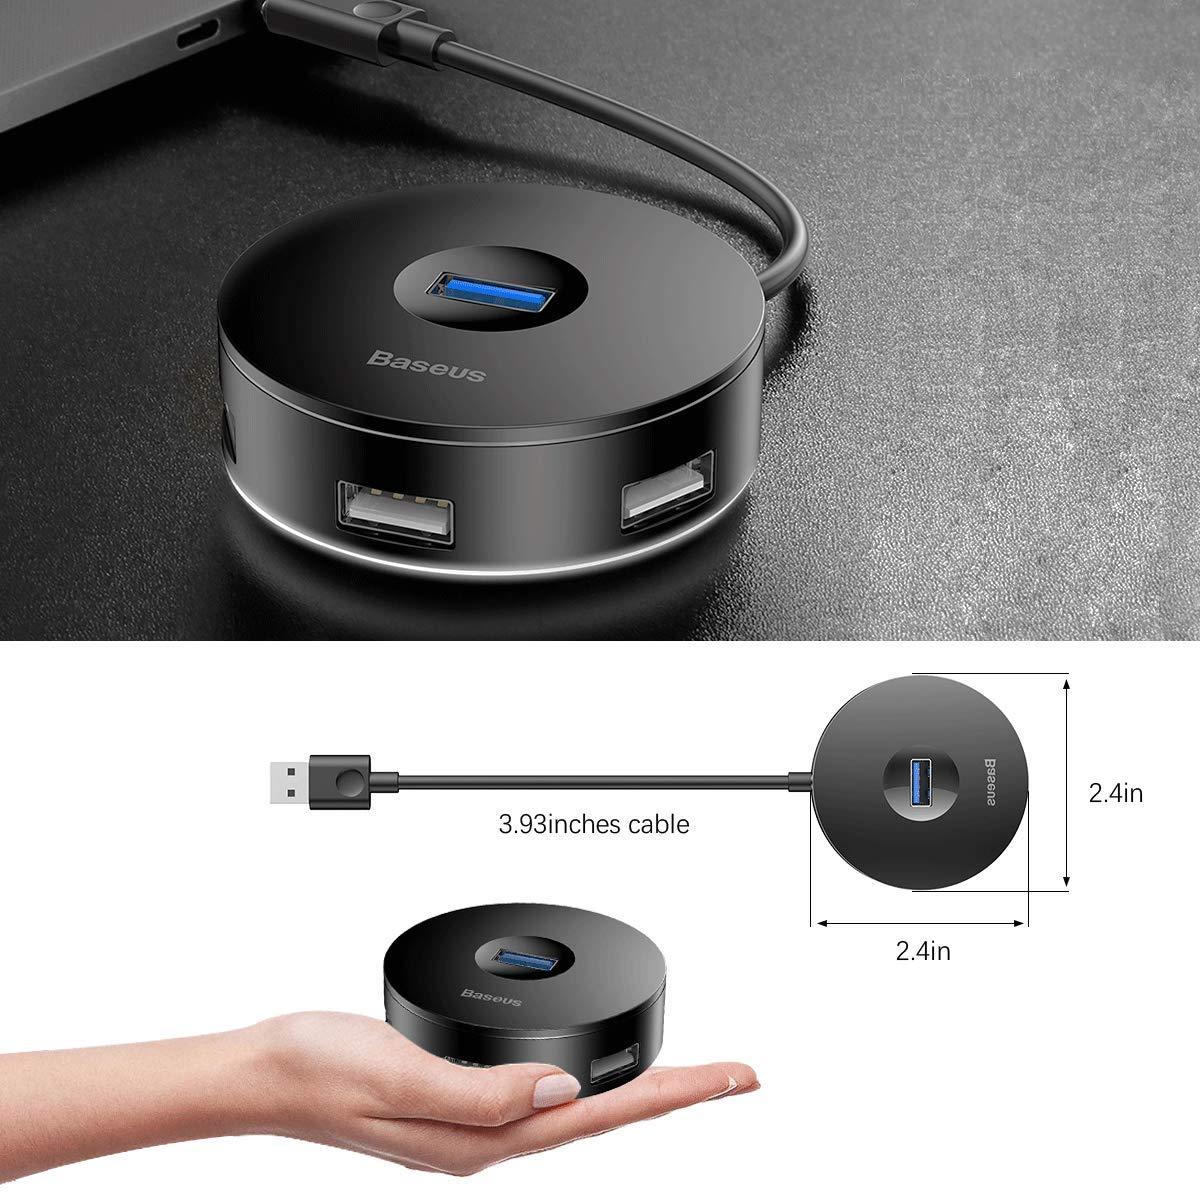 ORIGINAL] BASEUS Round Box Hub Adapter 4-in-1 USB Port with USB 3.0 for Mac  OS, Windows, Google, Linux